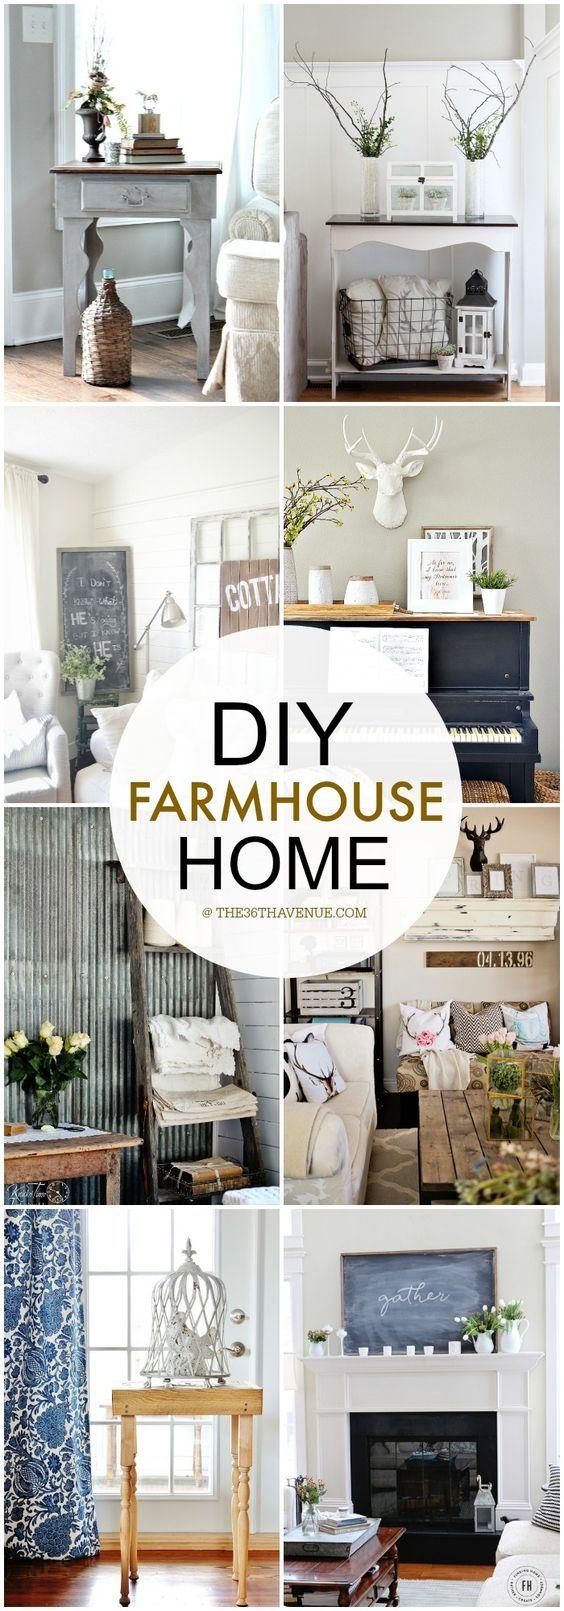 Home Decor DIY Projects - Farmhouse Design | Inspiration, DIY ...